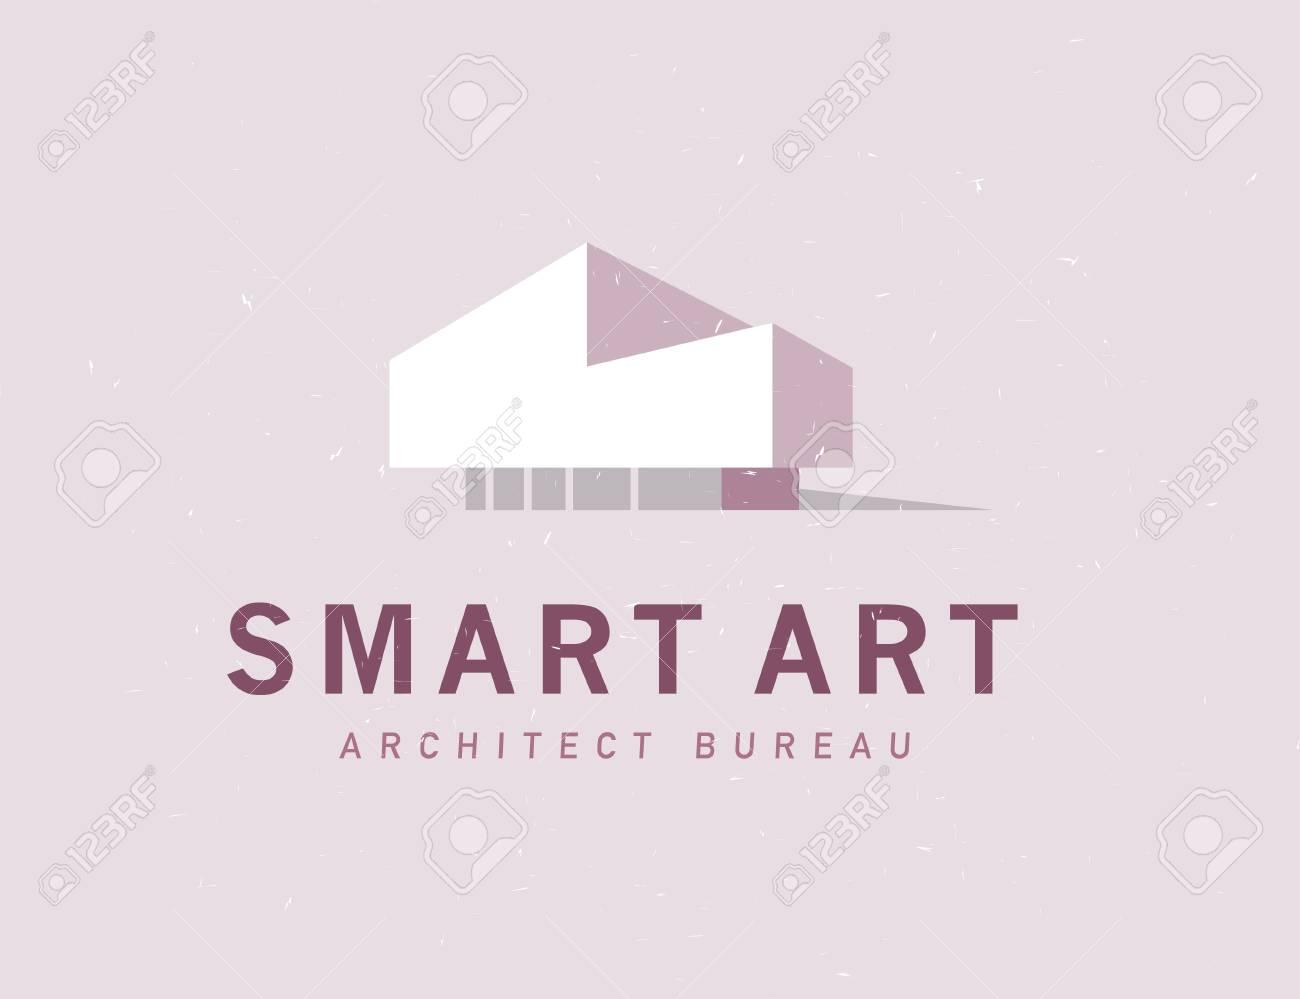 Vector Flat Architect Bureau Logo Design Isolated On Light ...